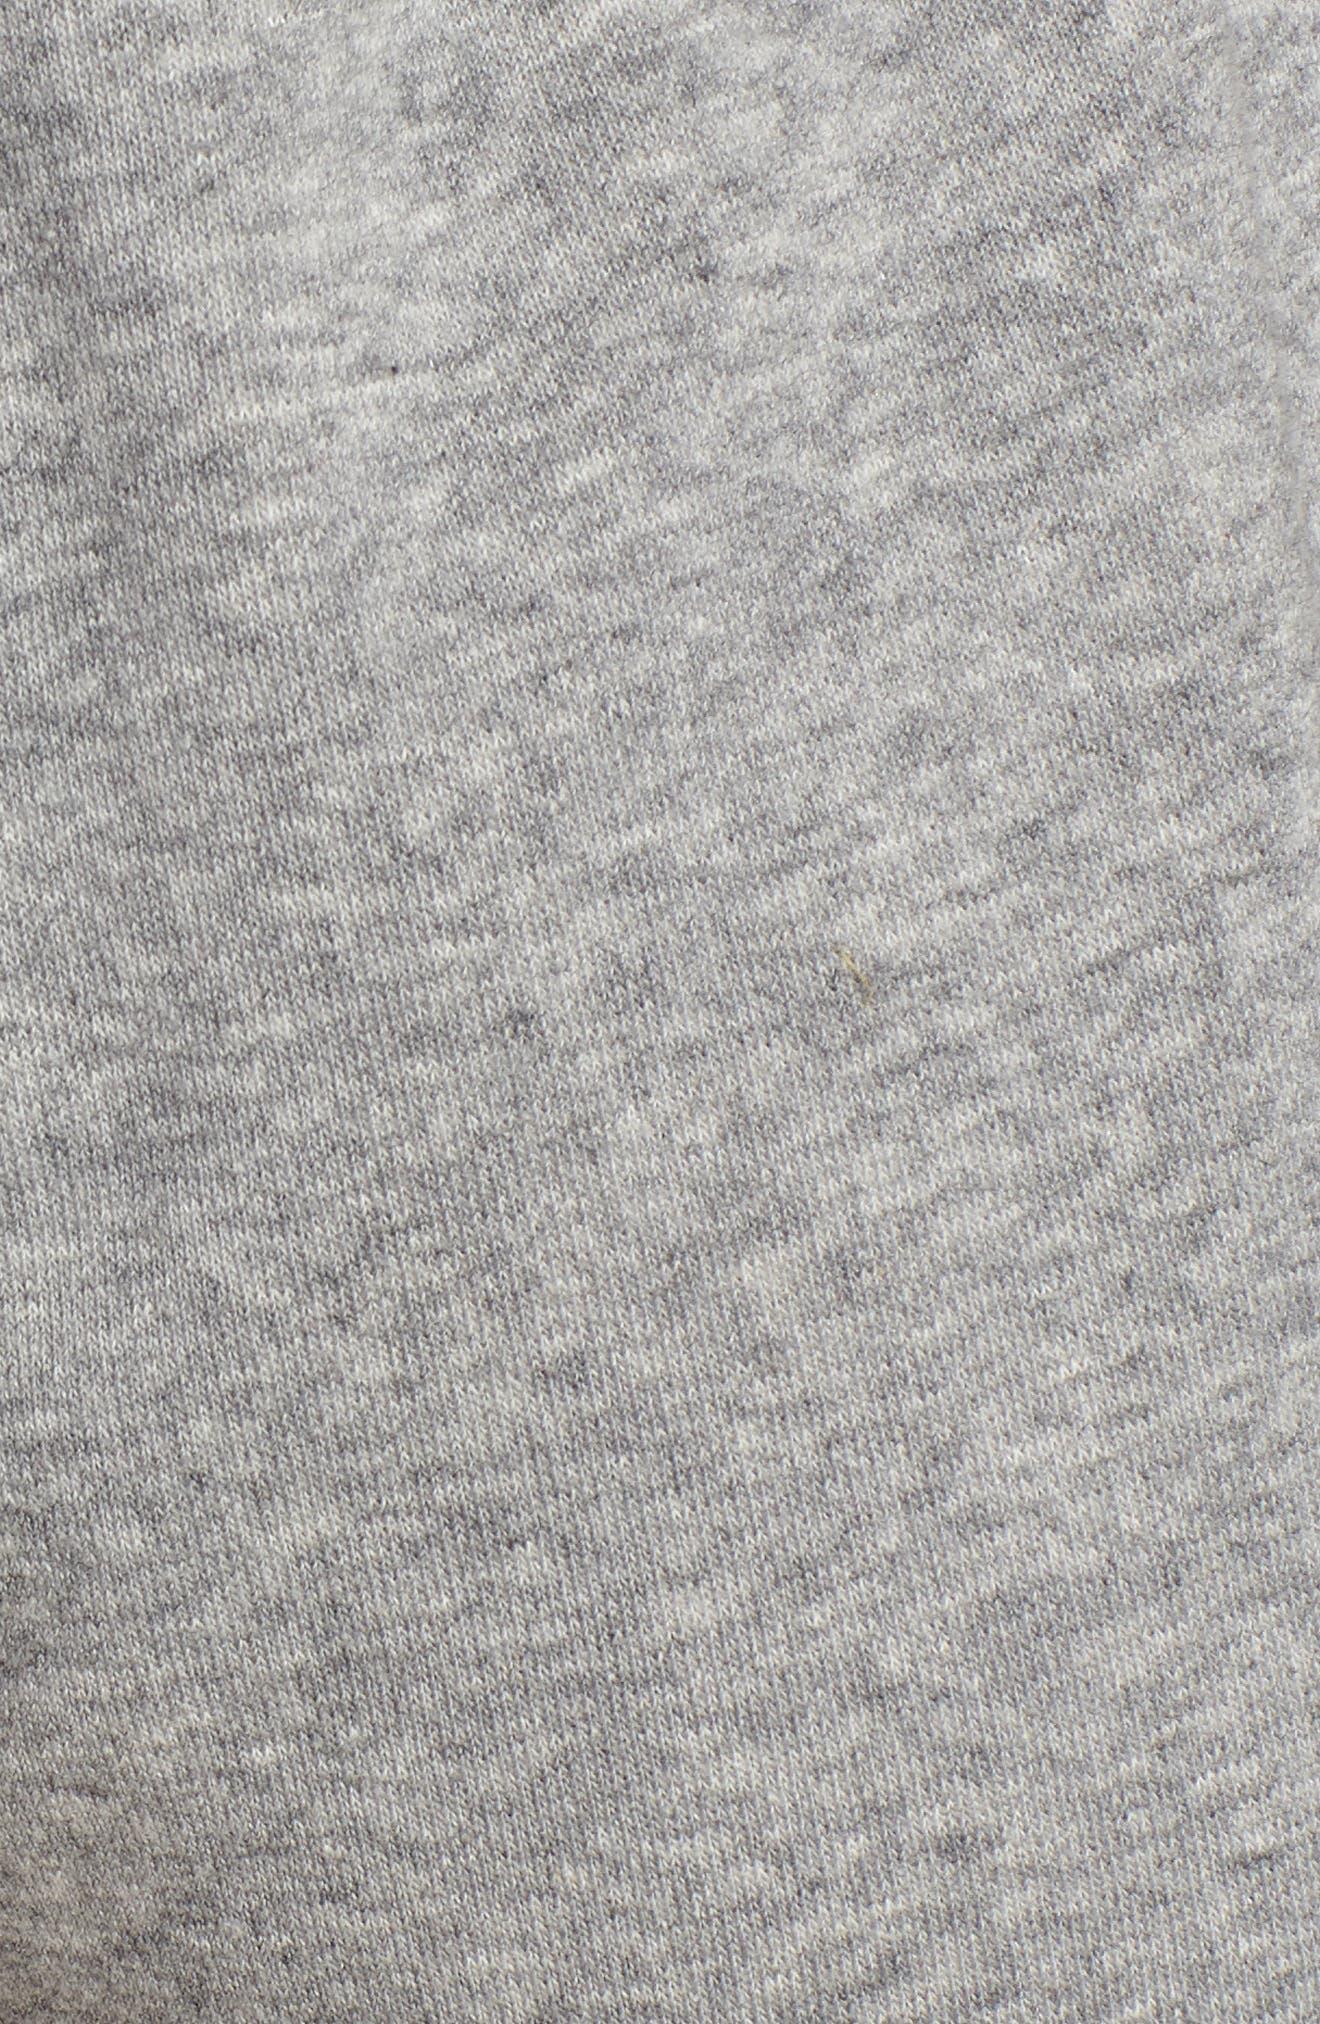 Rolled Drawstring Shorts,                             Alternate thumbnail 5, color,                             050